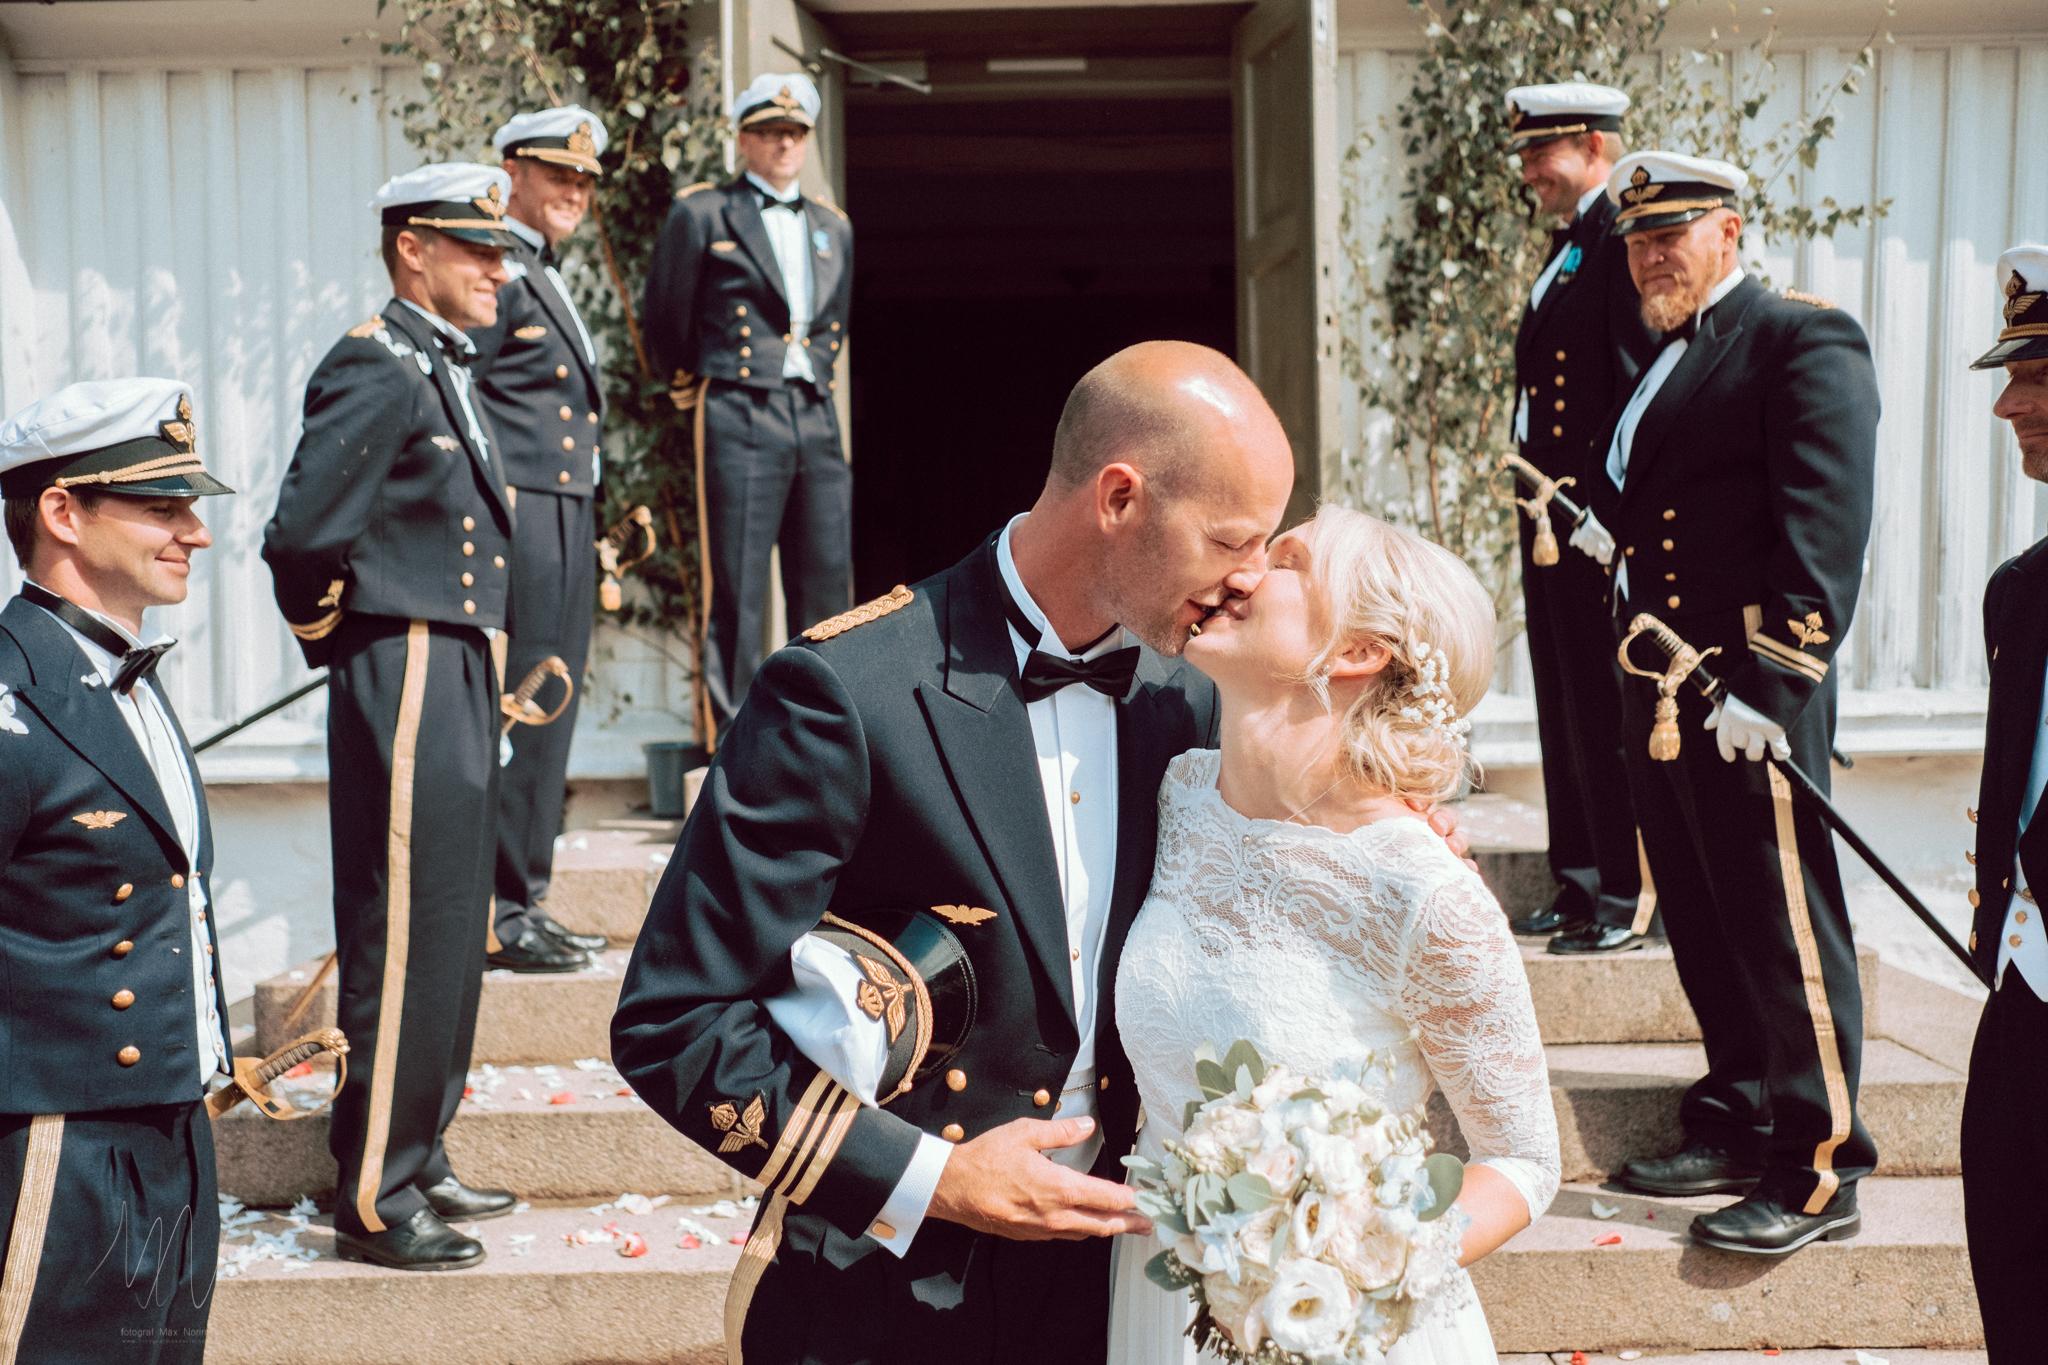 Bröllop-fotografmaxnorin.se-MariaMarcus-167.JPG